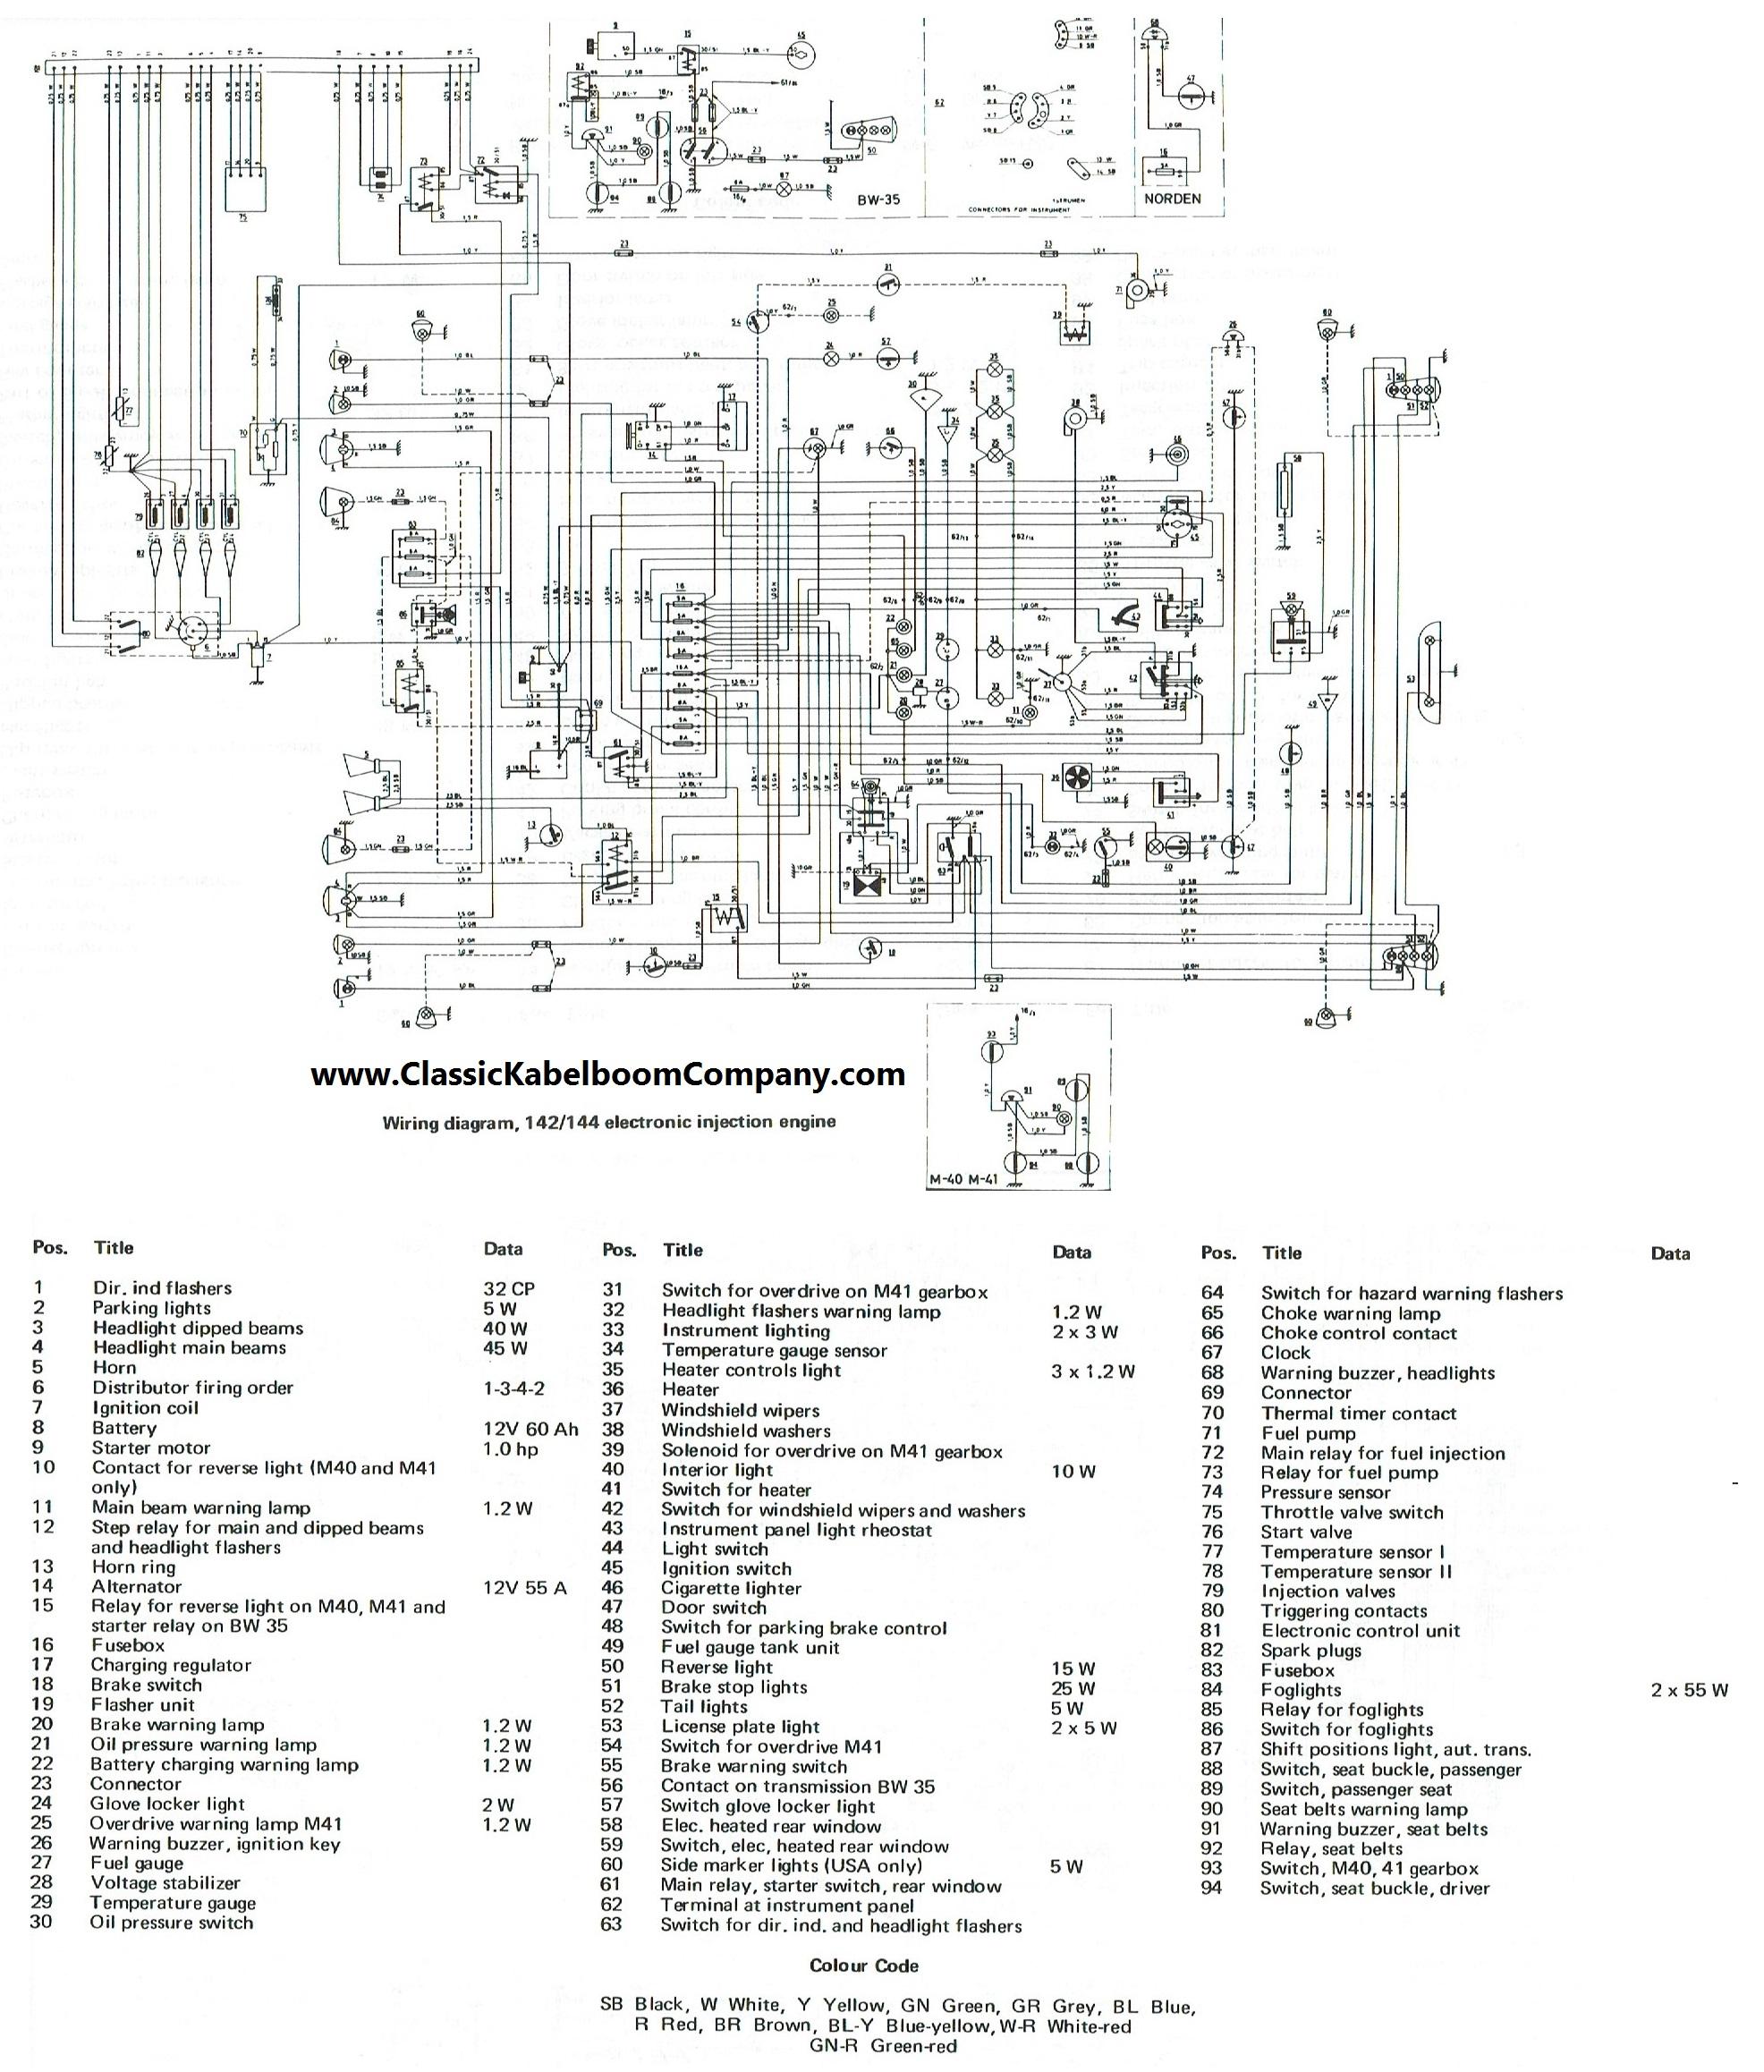 classic kabelboom company elektrisch bedrading schema volvo rh classickabelboomcompany com Volvo V70 Electrical Diagram Volvo V70 Electrical Diagram